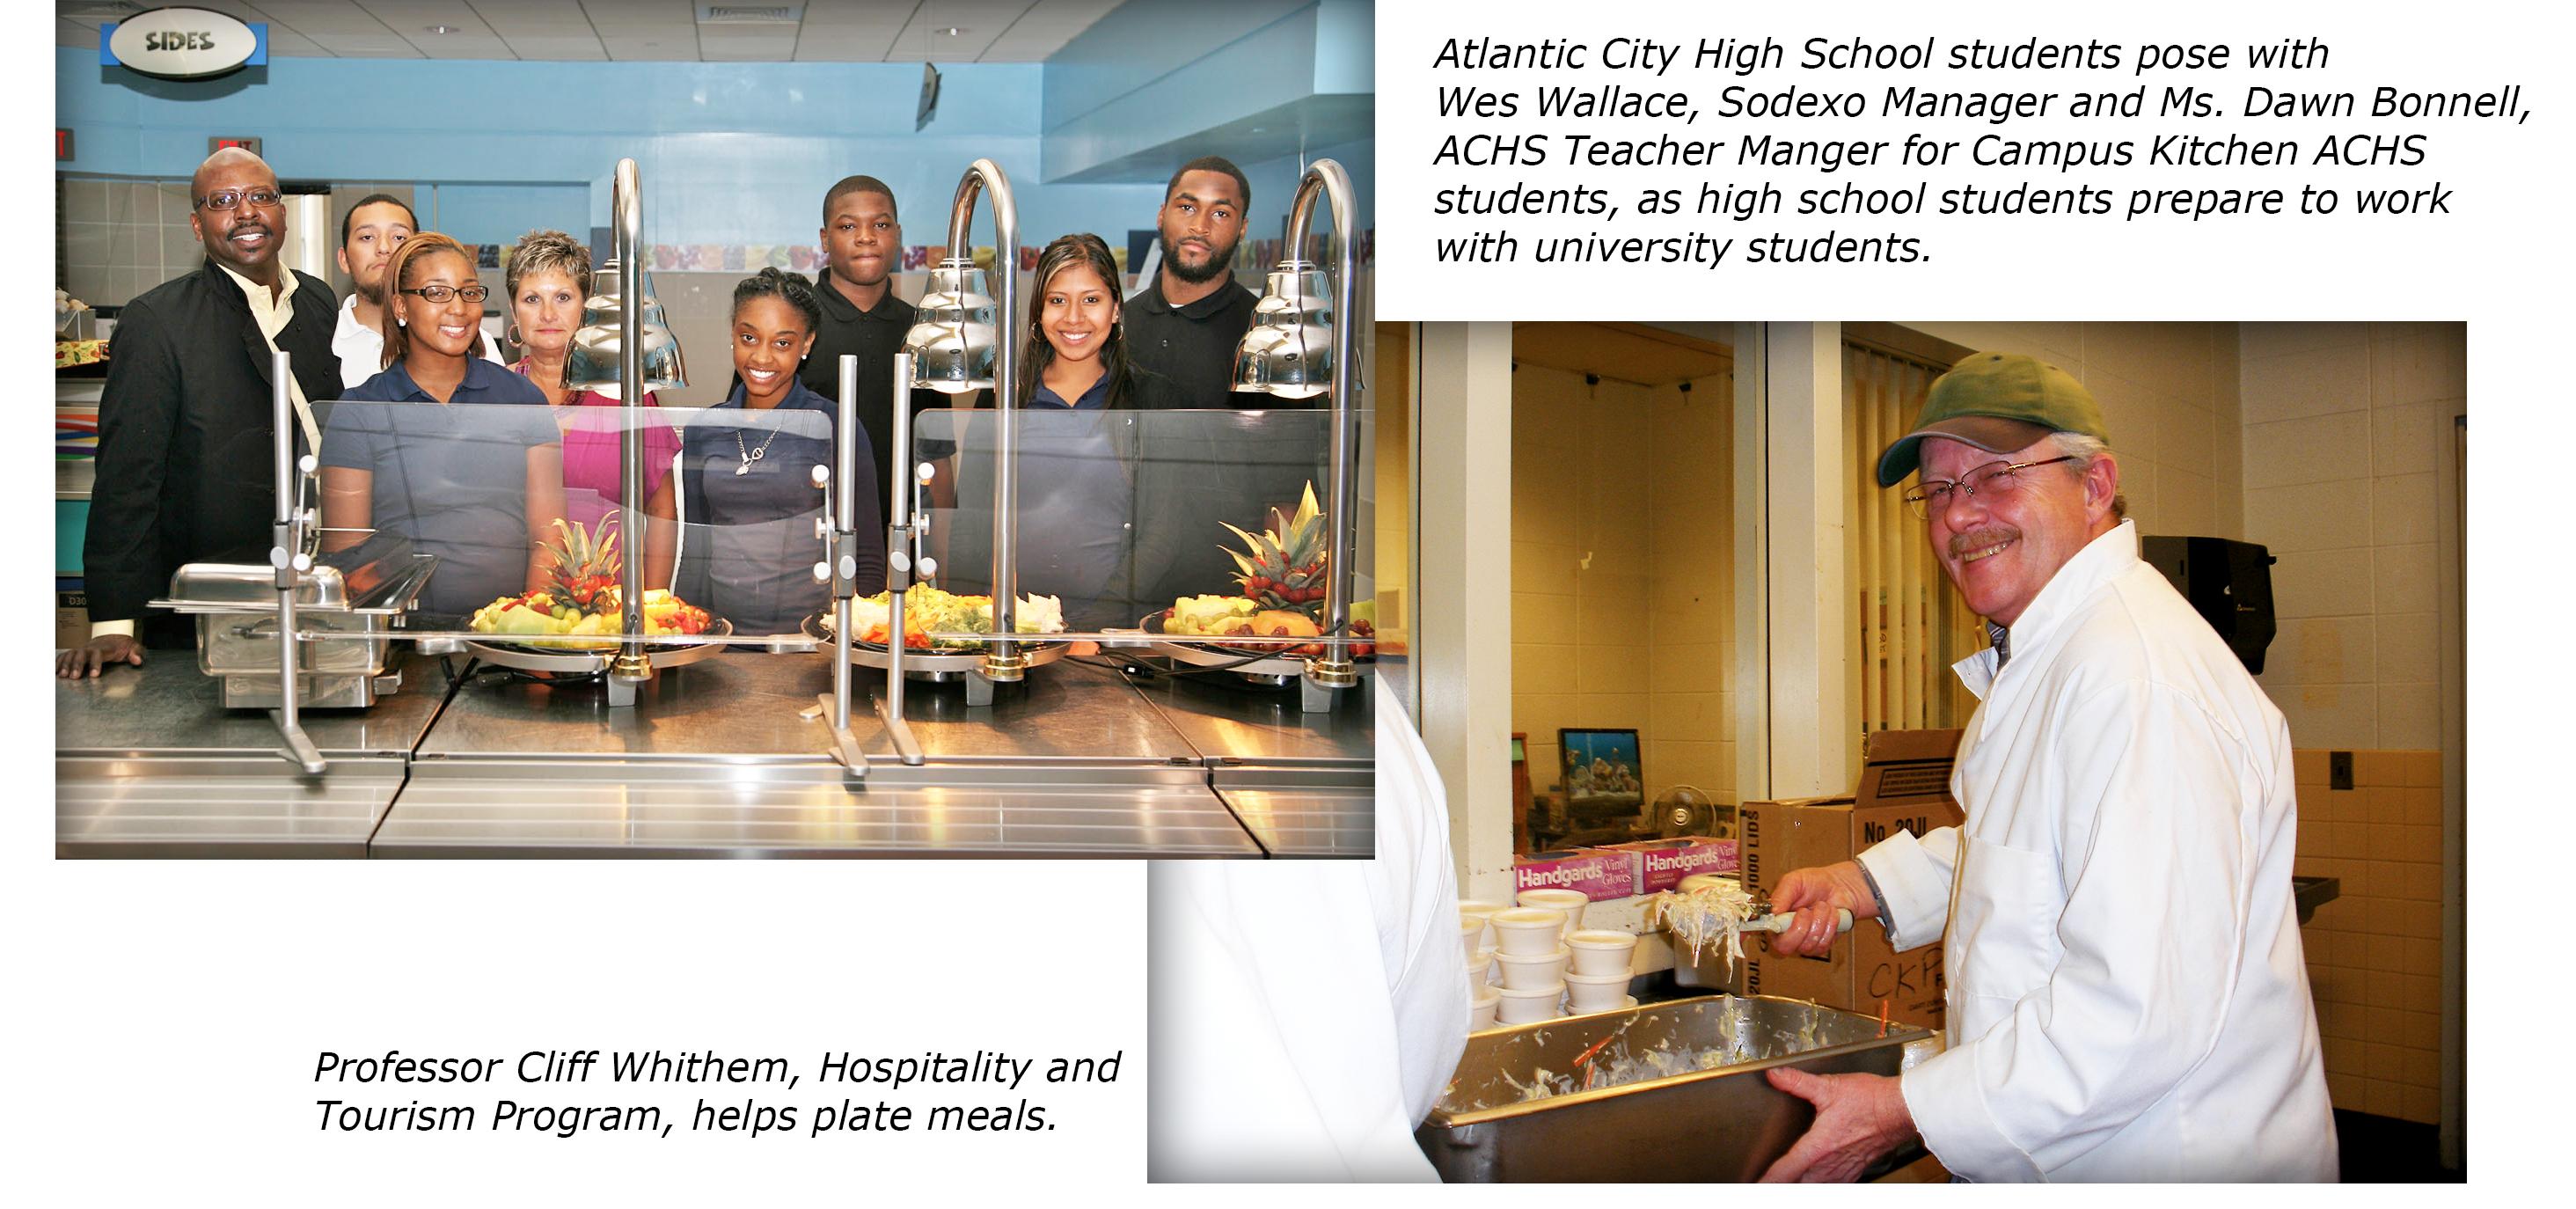 The Campus Kitchen at Atlantic City